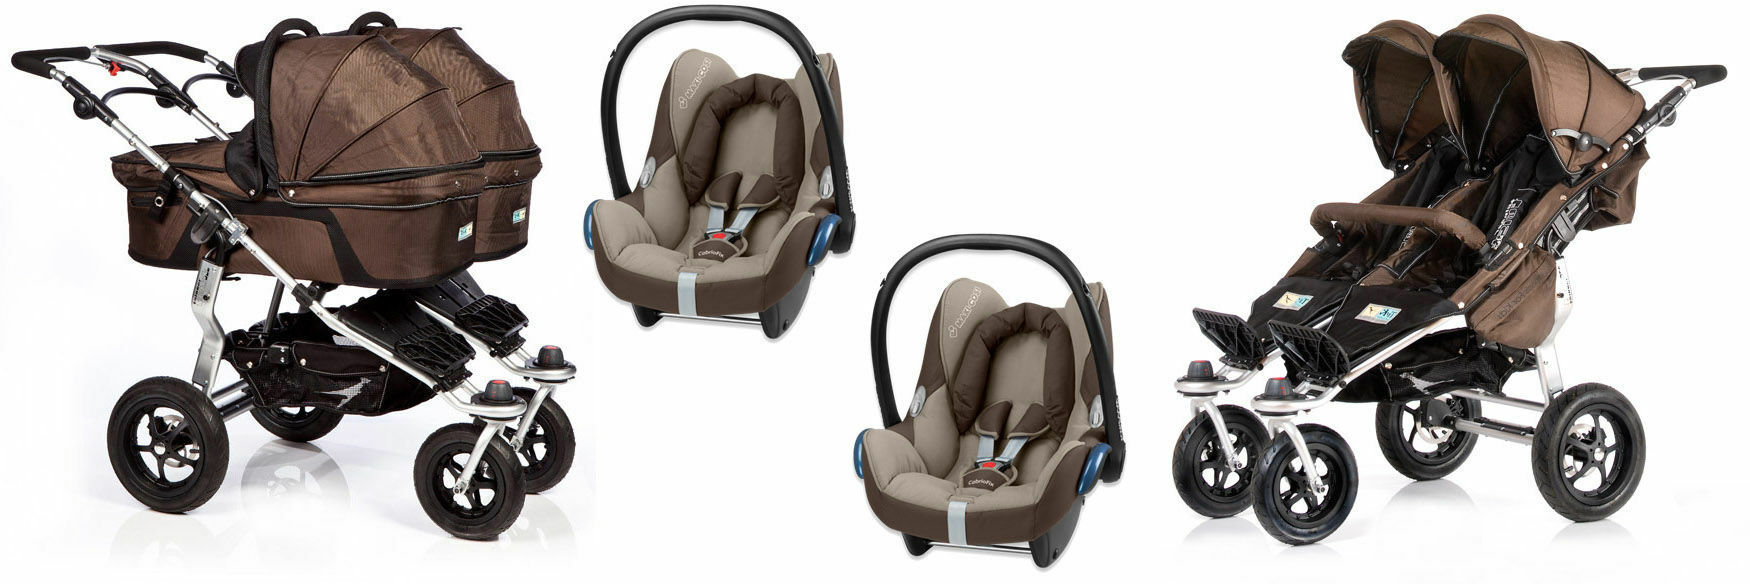 Wózki 3w1 Maxi Cosi